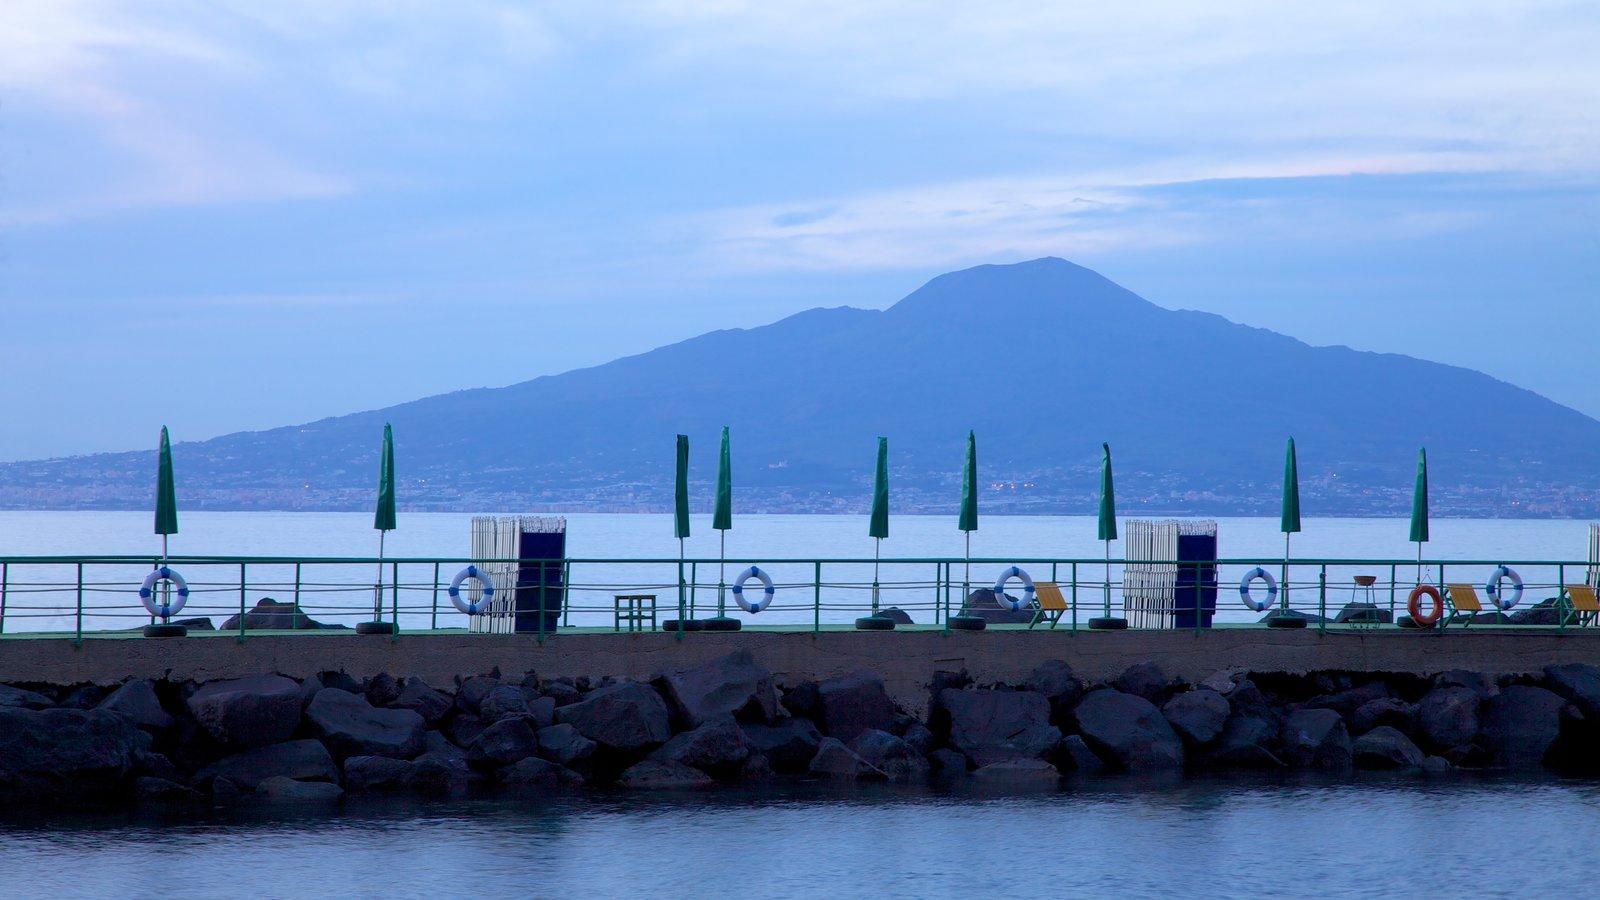 Mount Vesuvius - Pompei featuring general coastal views and mountains